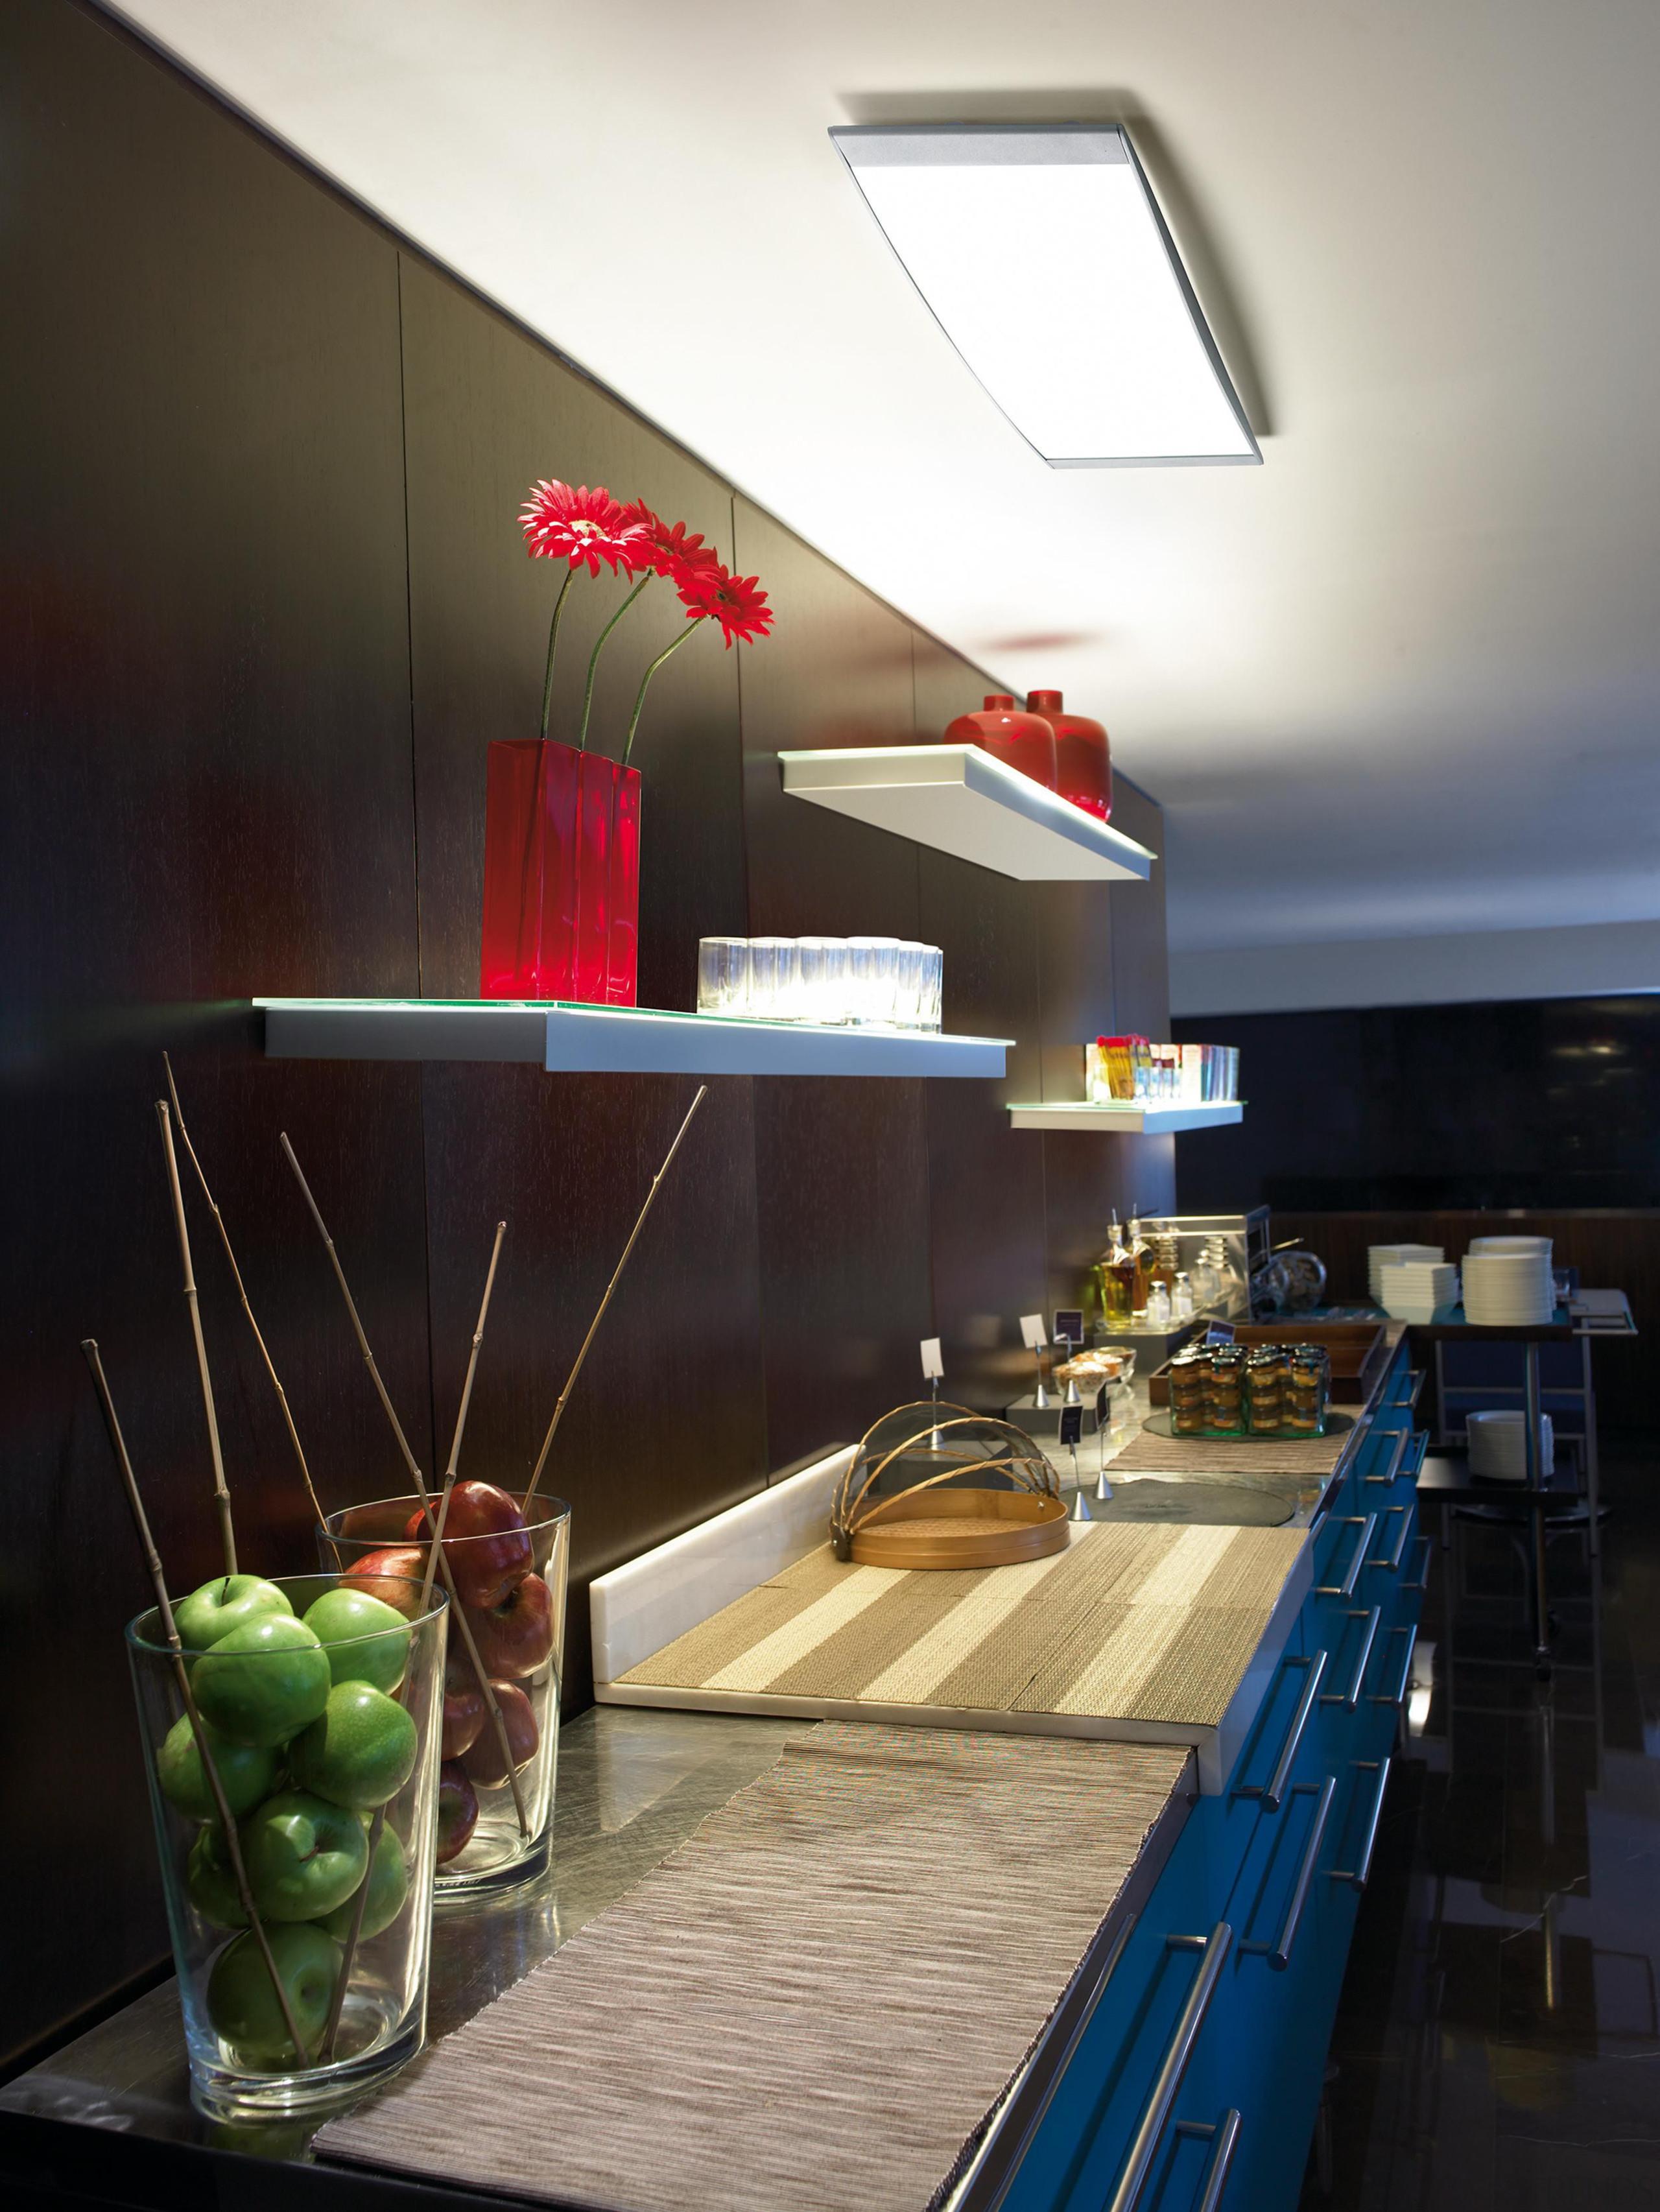 Alpen from La Creu, Spain - Ceiling Lights ceiling, countertop, interior design, kitchen, table, black